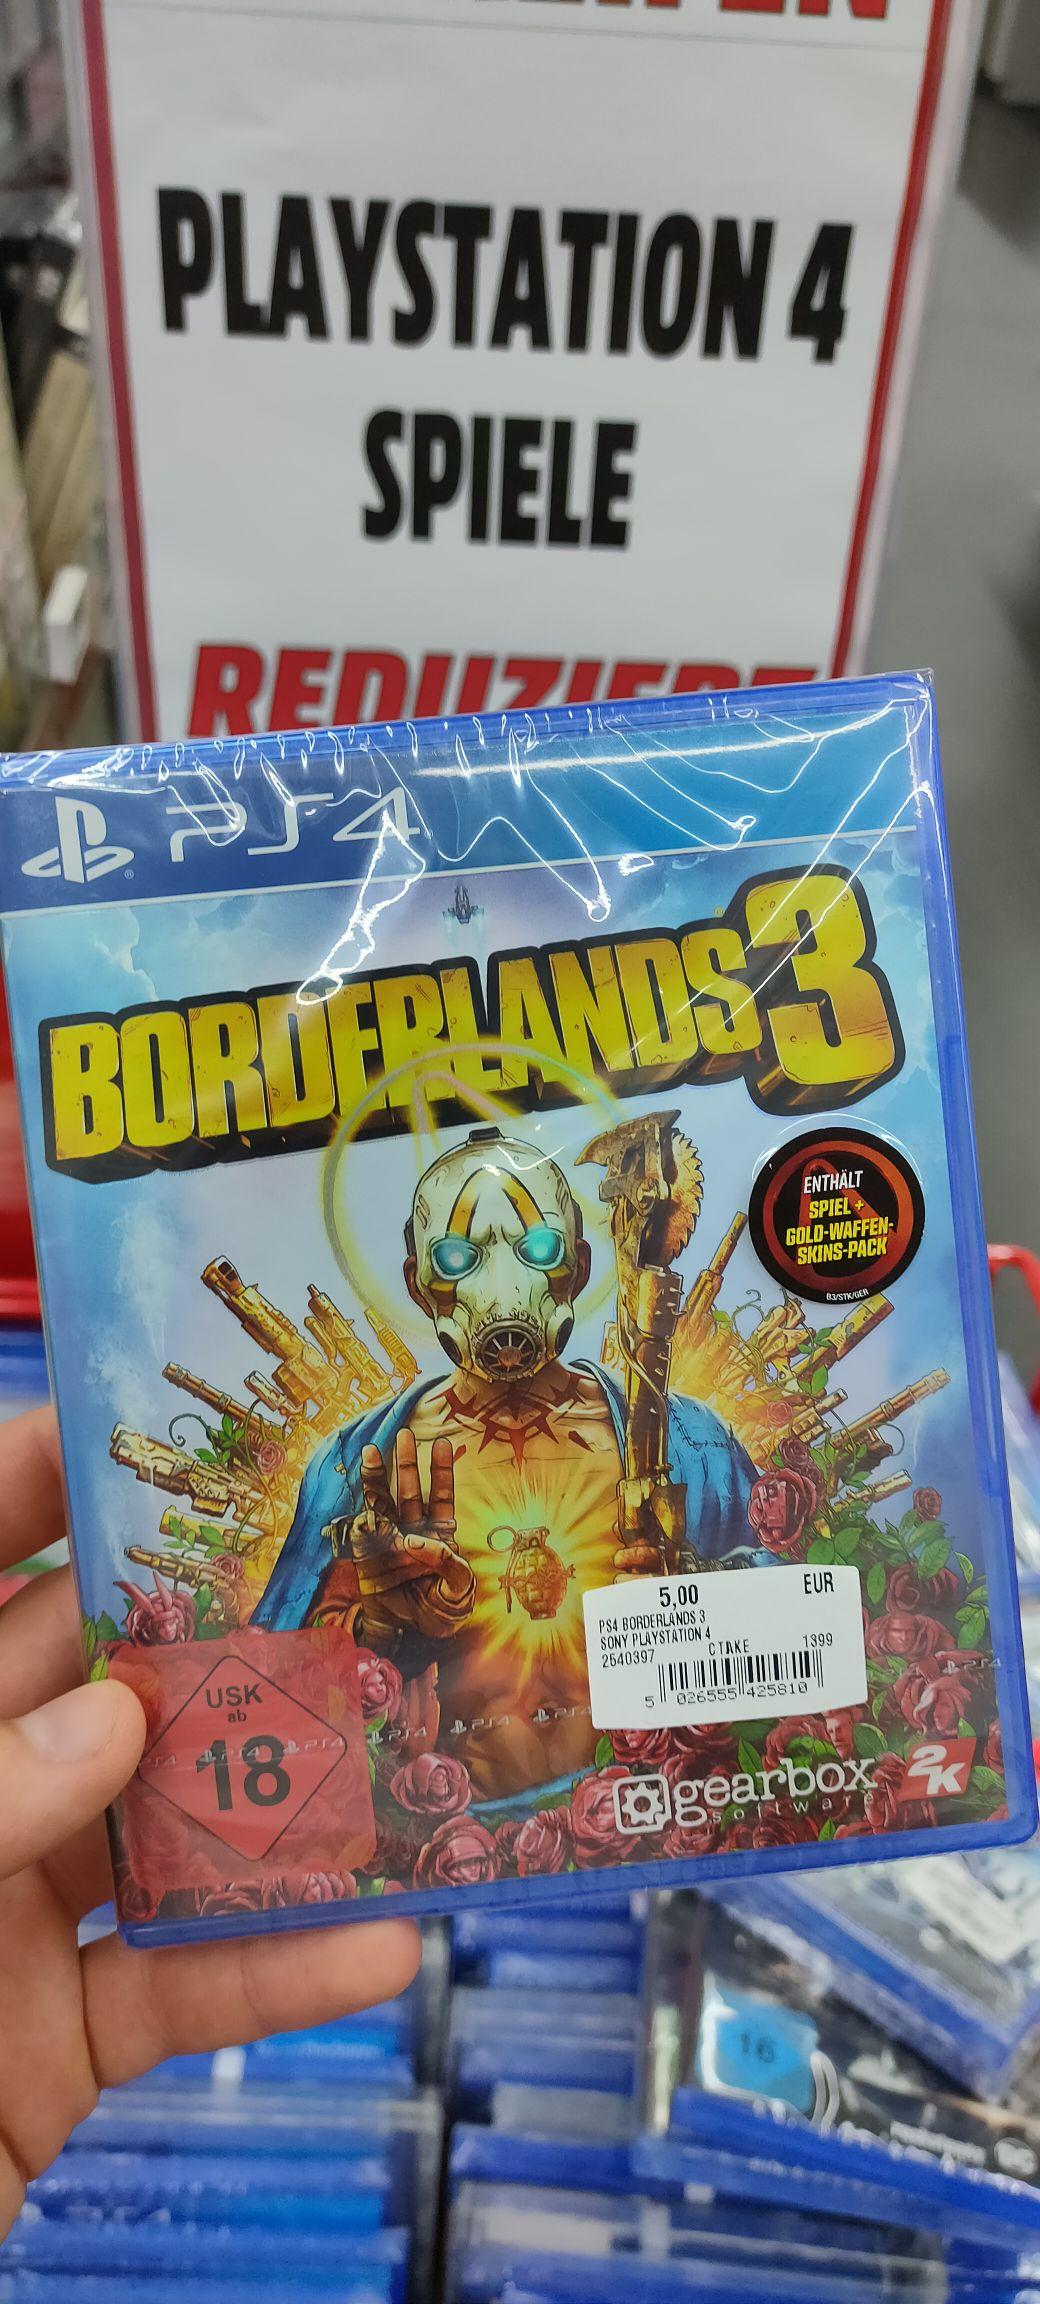 Lokal - PS4 Borderlands 3 Mediamarkt Chorweiler Köln für 5€